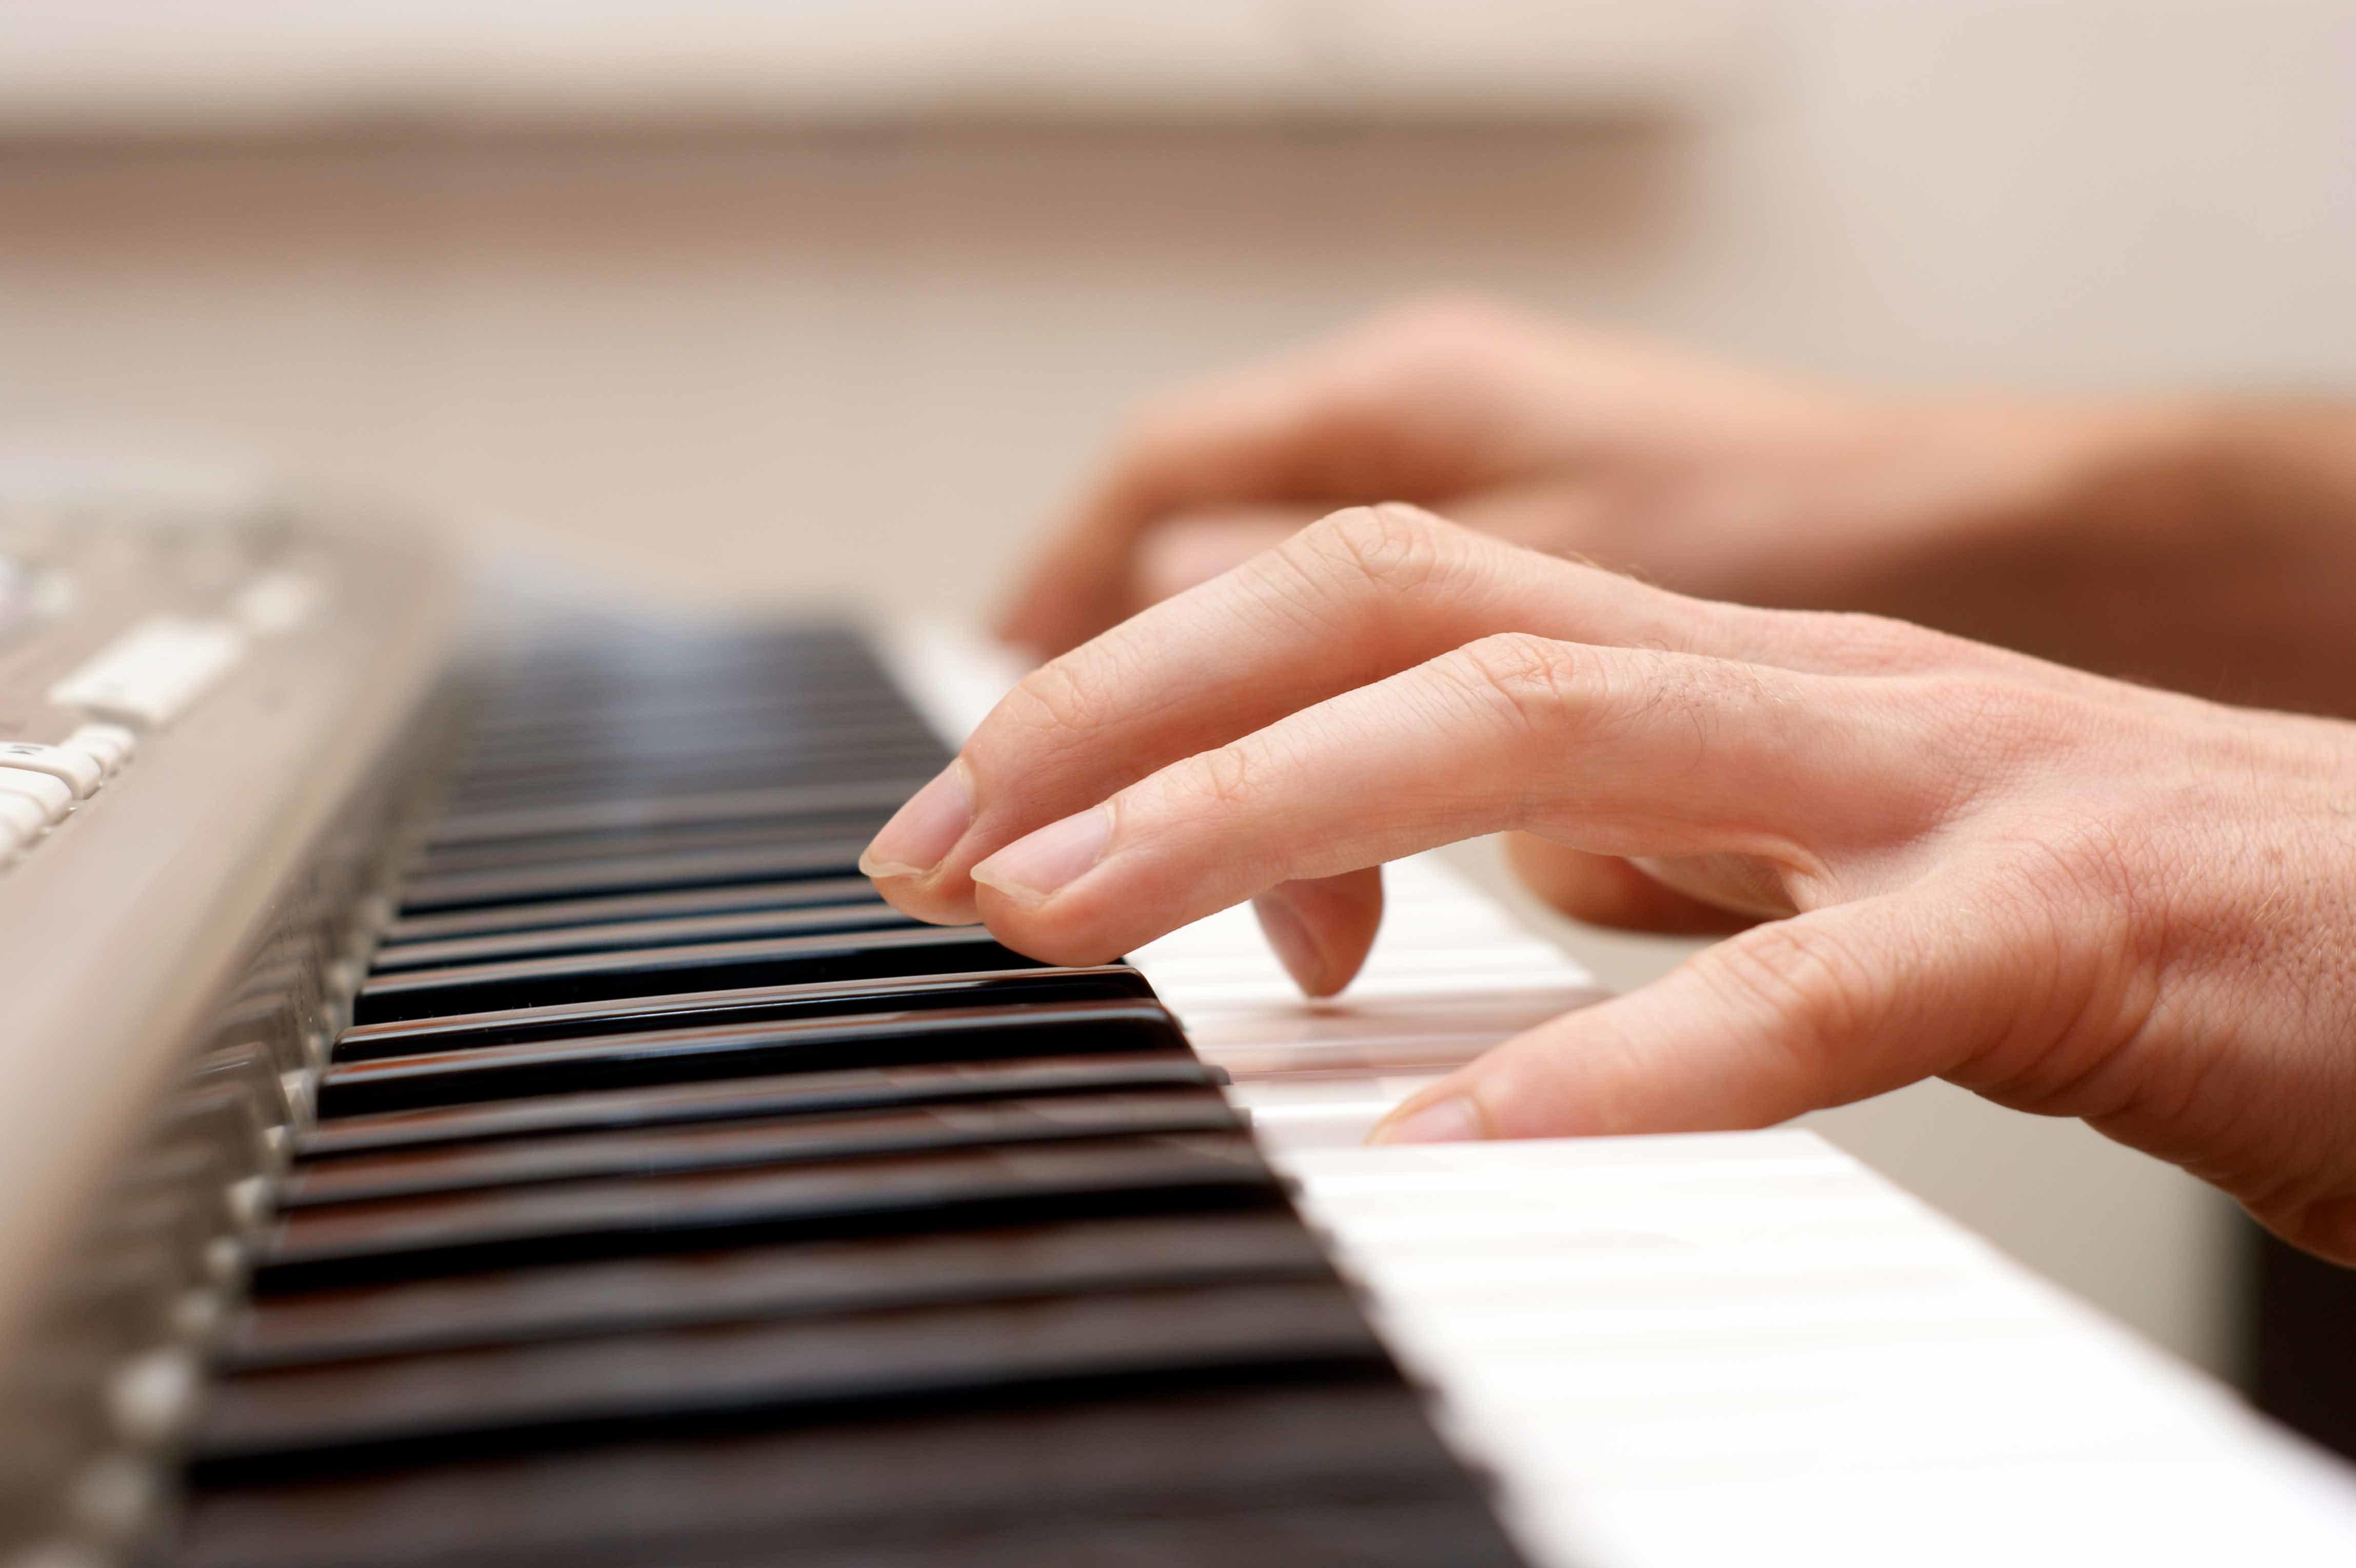 руки пианиста картинки фотосессии